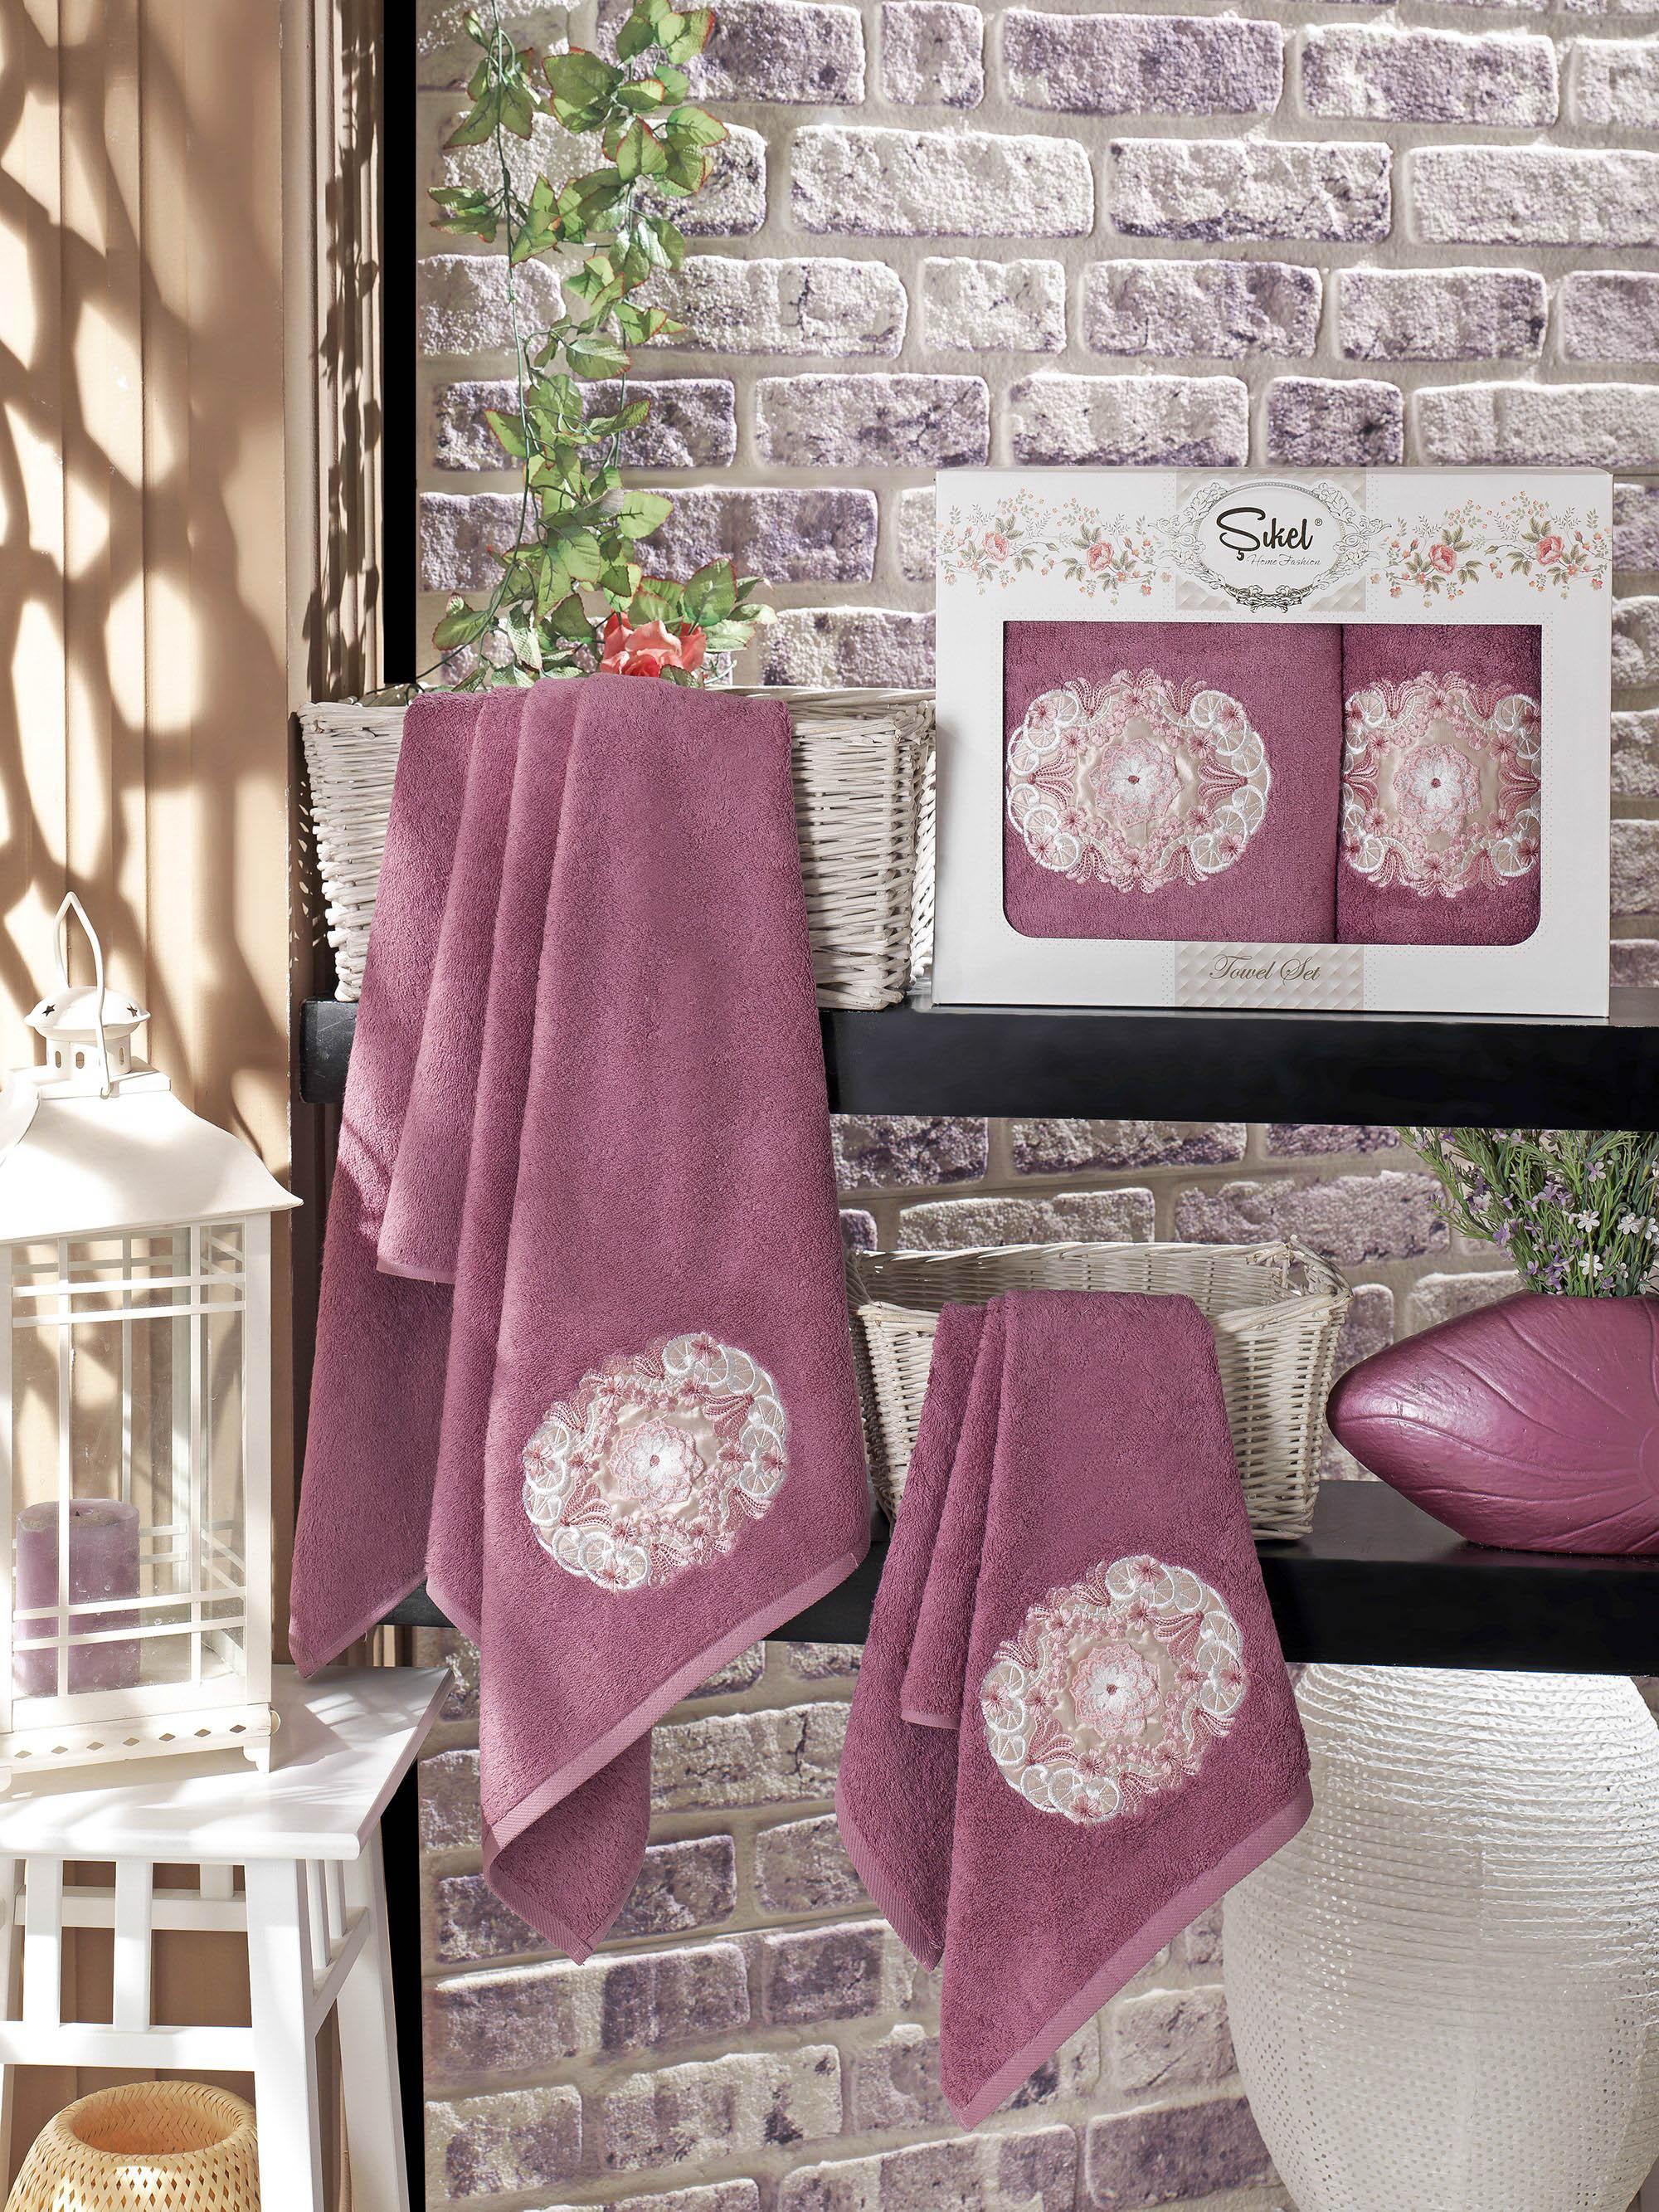 Полотенца Sikel Набор из 2 полотенец Kamelya Цвет: Фиолетовый набор из 2 полотенец merzuka sakura 50х90 70х140 8430 кремовый